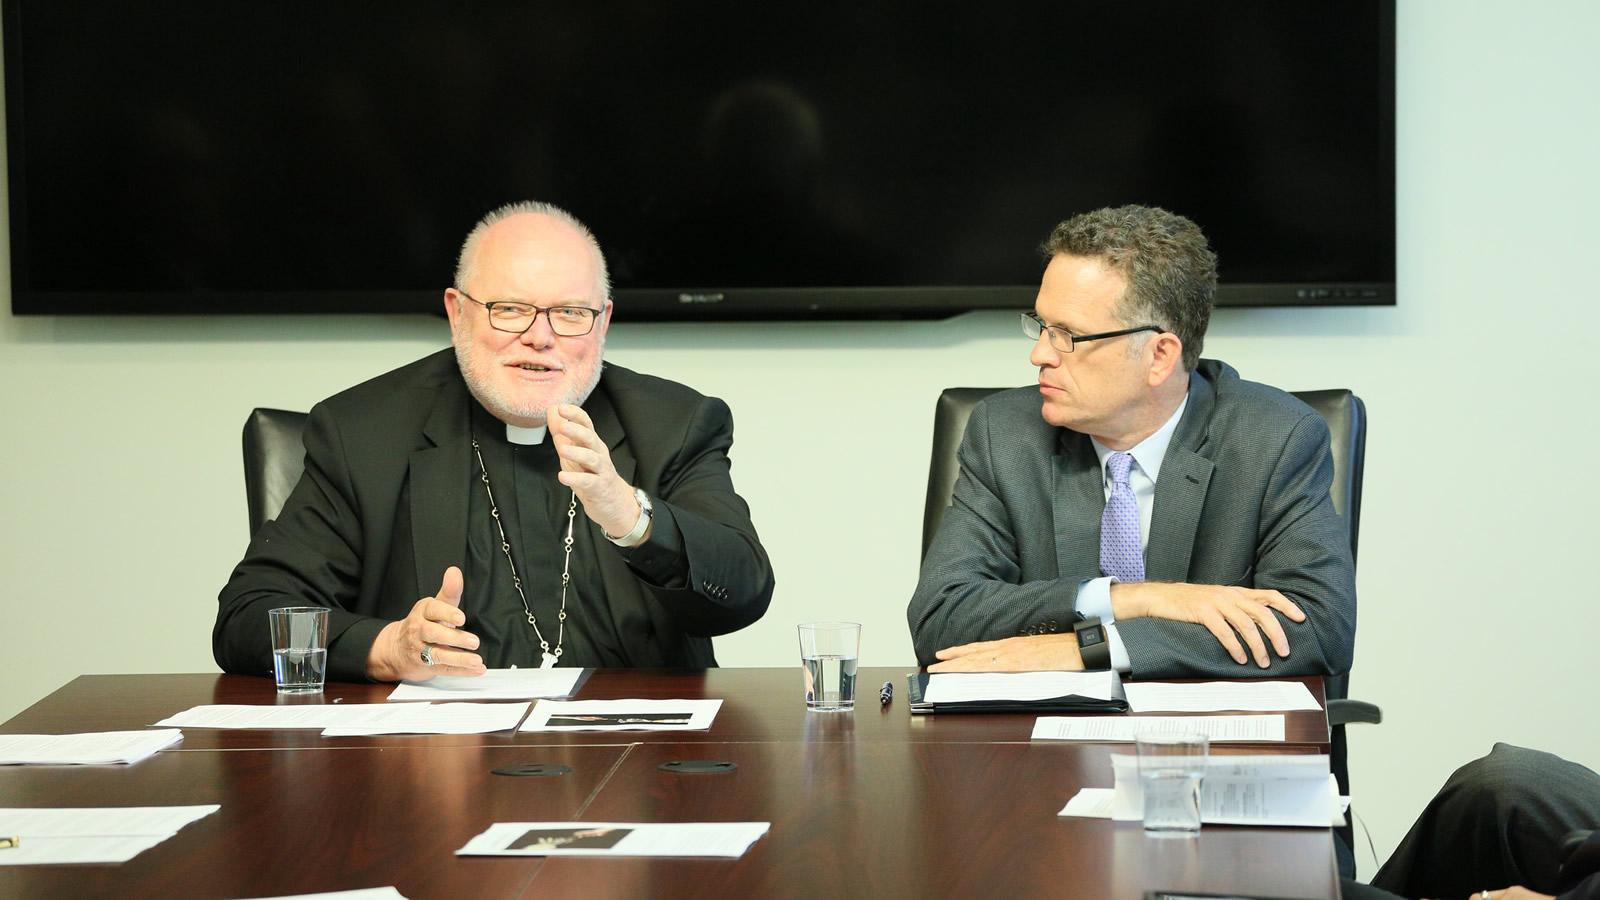 Thomas Banchoff Listens to Cardinal Reinhard Marx